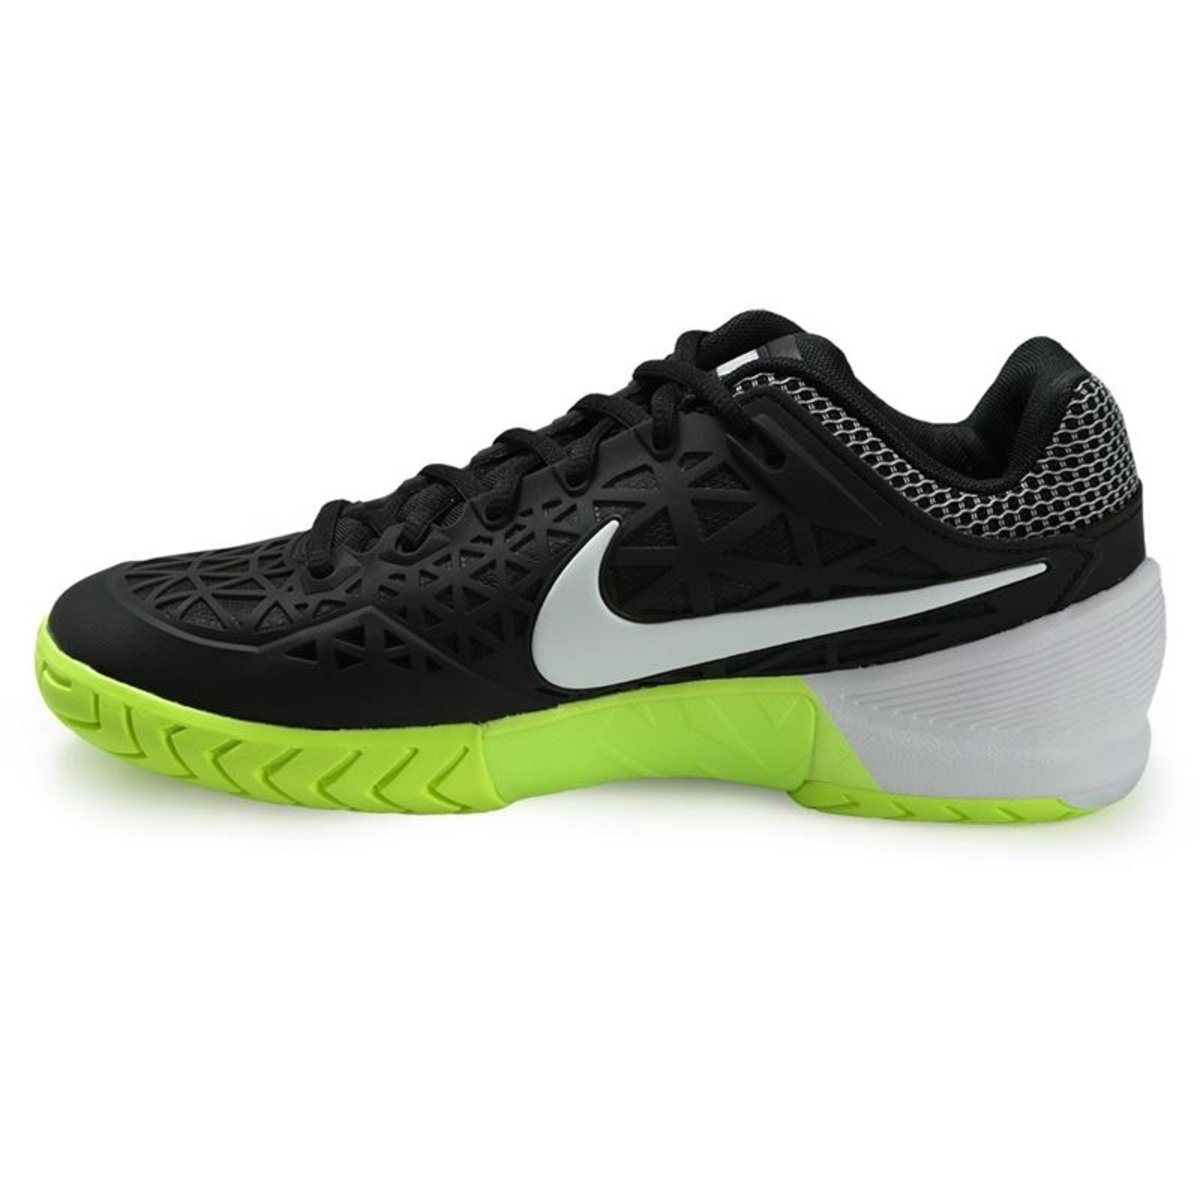 uk availability 36349 e8597 Amazon.com   Nike Zoom Cage 2 Black White Volt Women s Tennis Shoes   Shoes